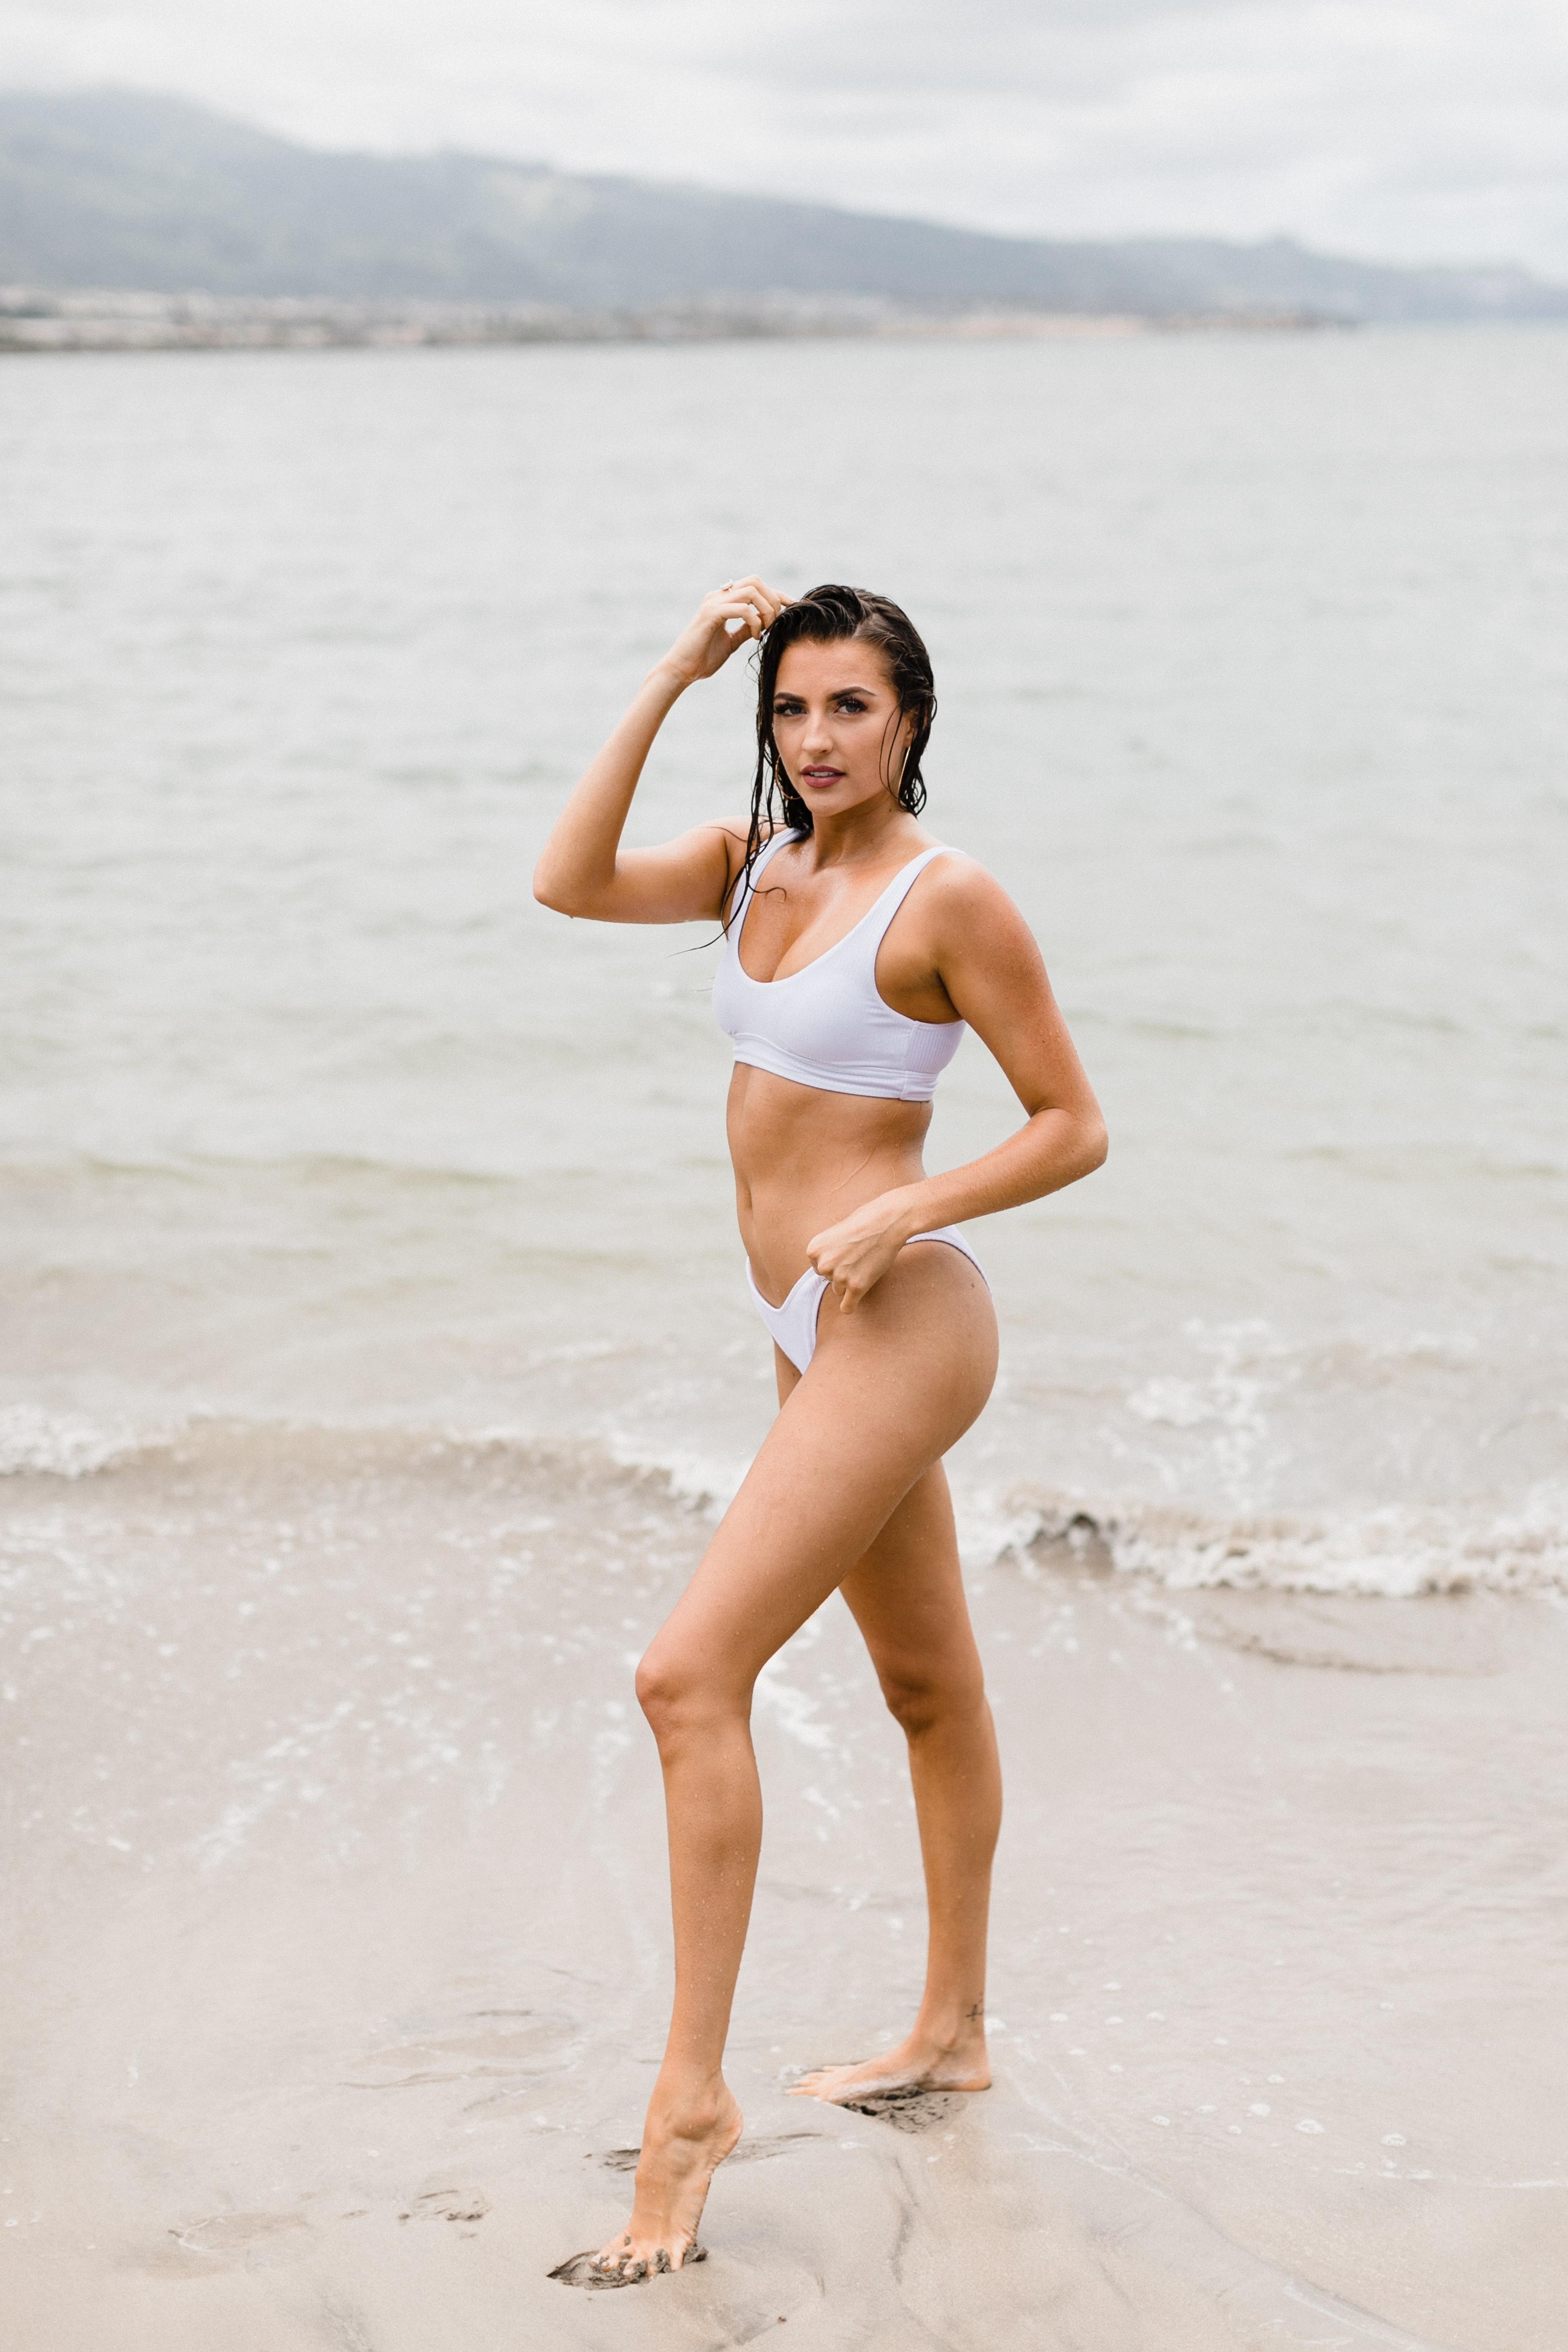 Mobile Rapid Spray Tan - Miss Hawaii